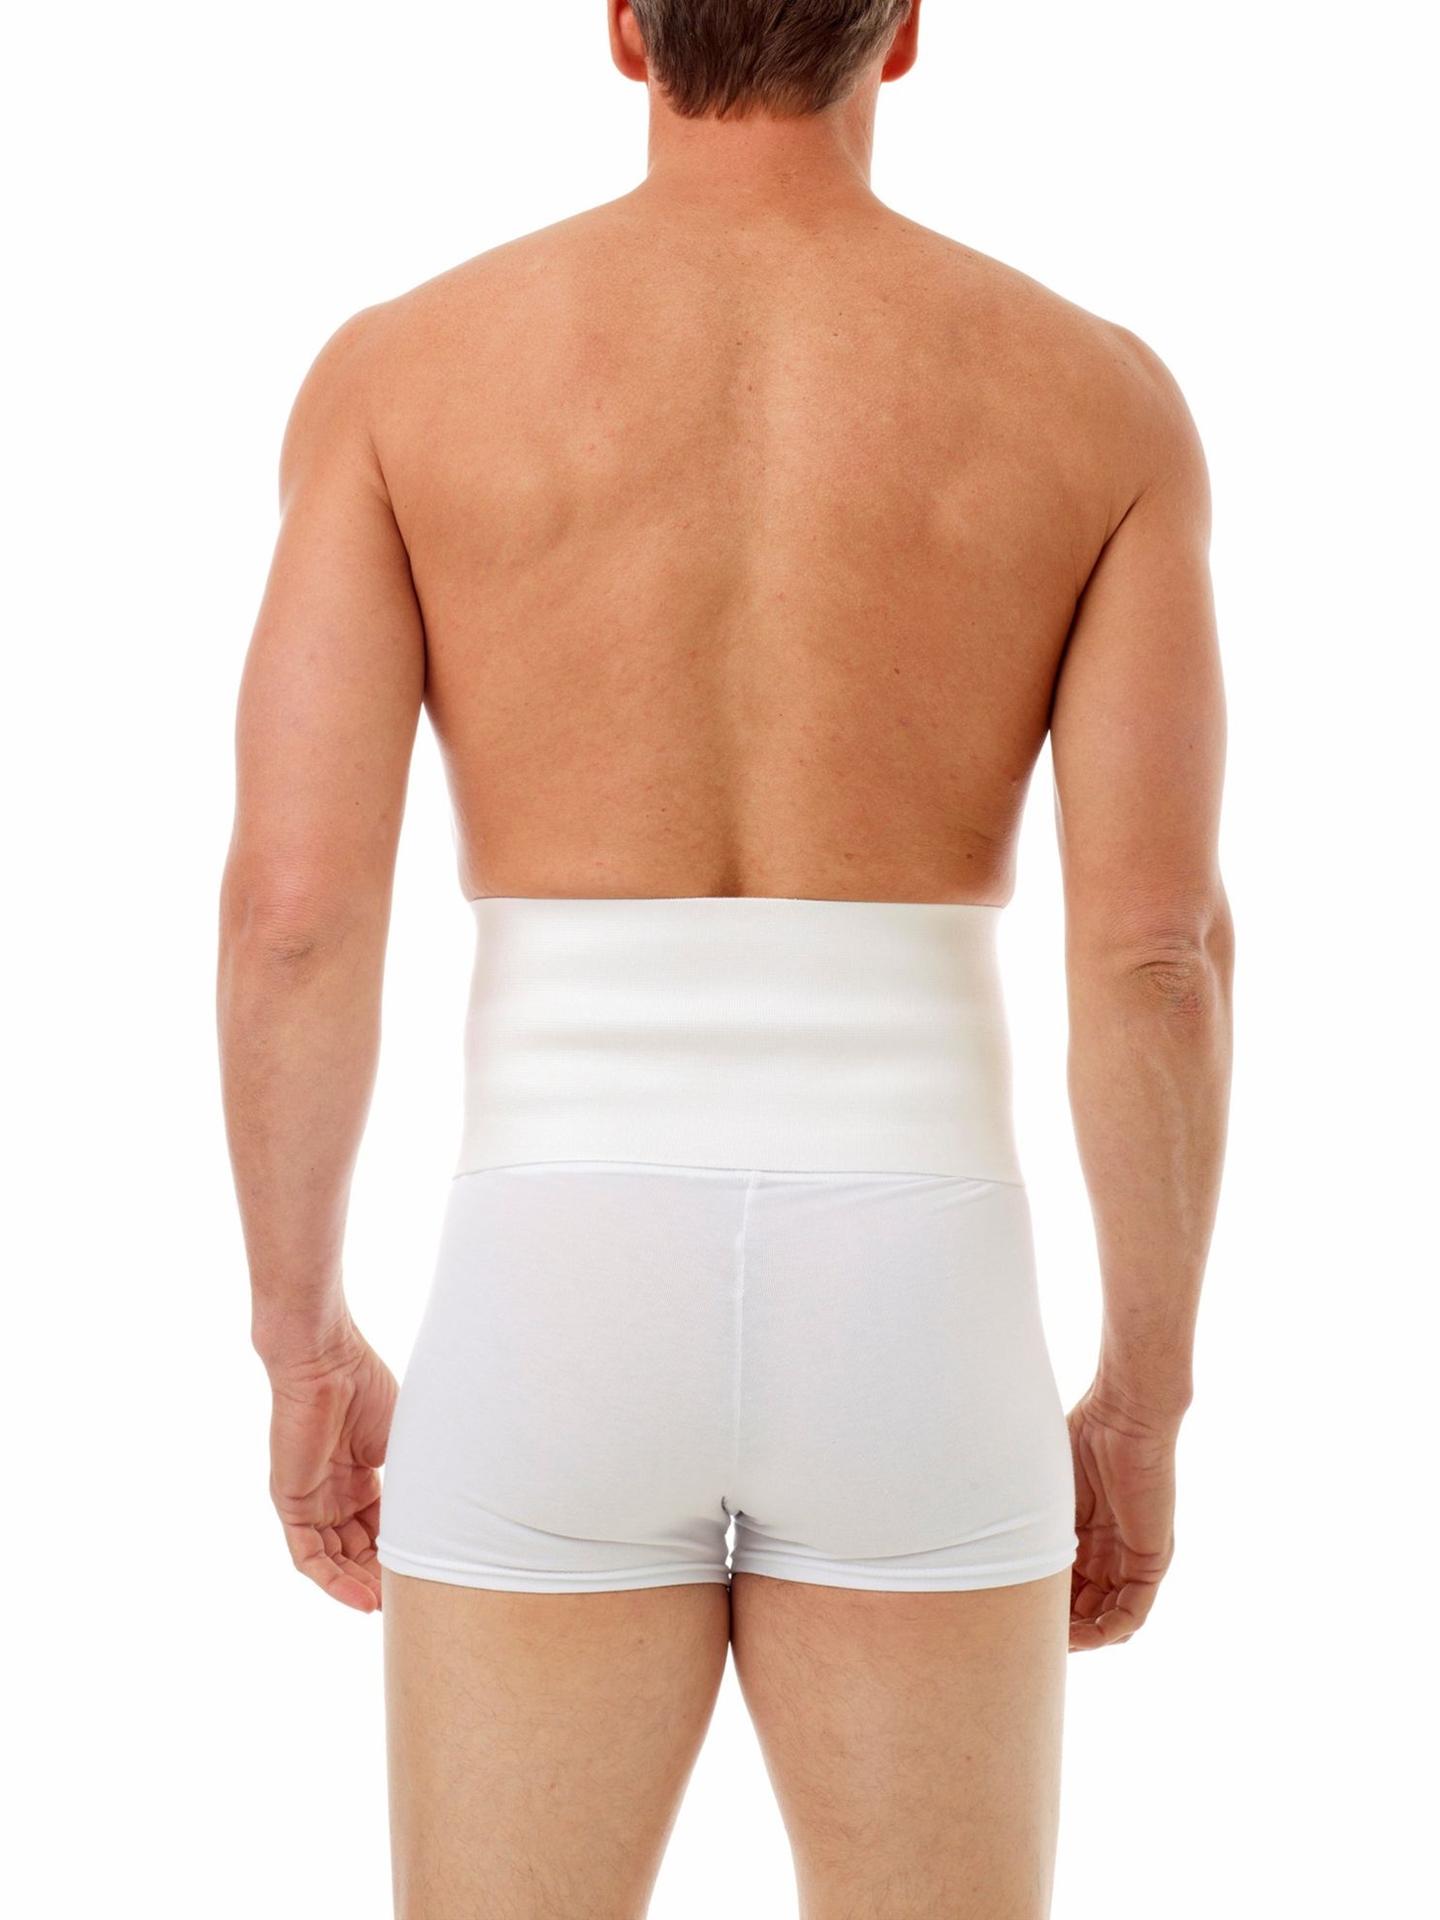 men abdominal Velcro Belt